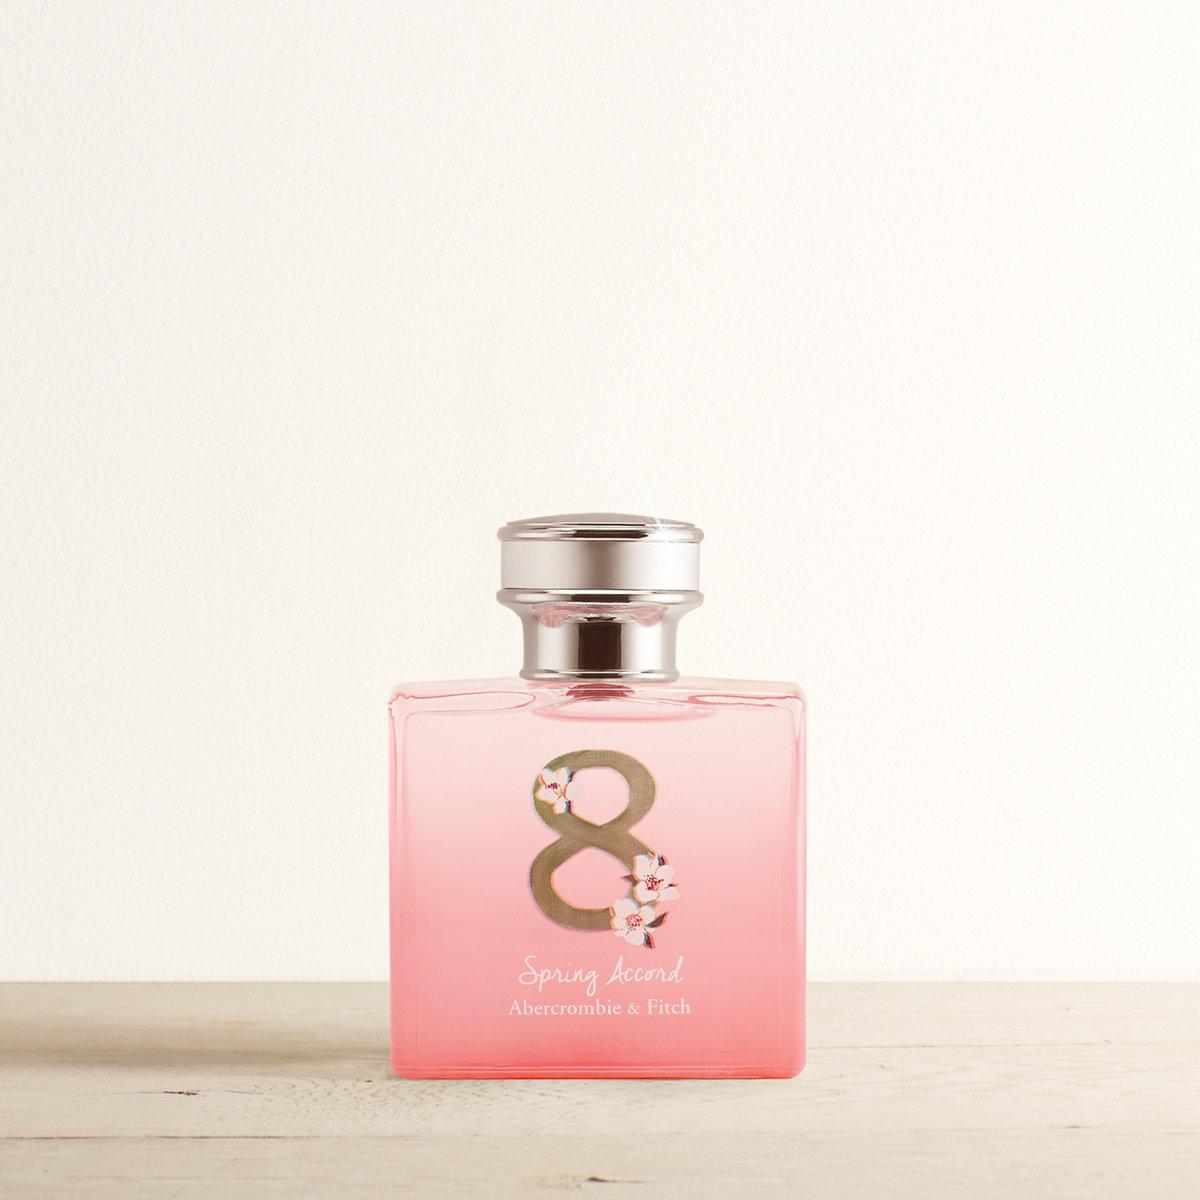 8 Spring Accord Perfume